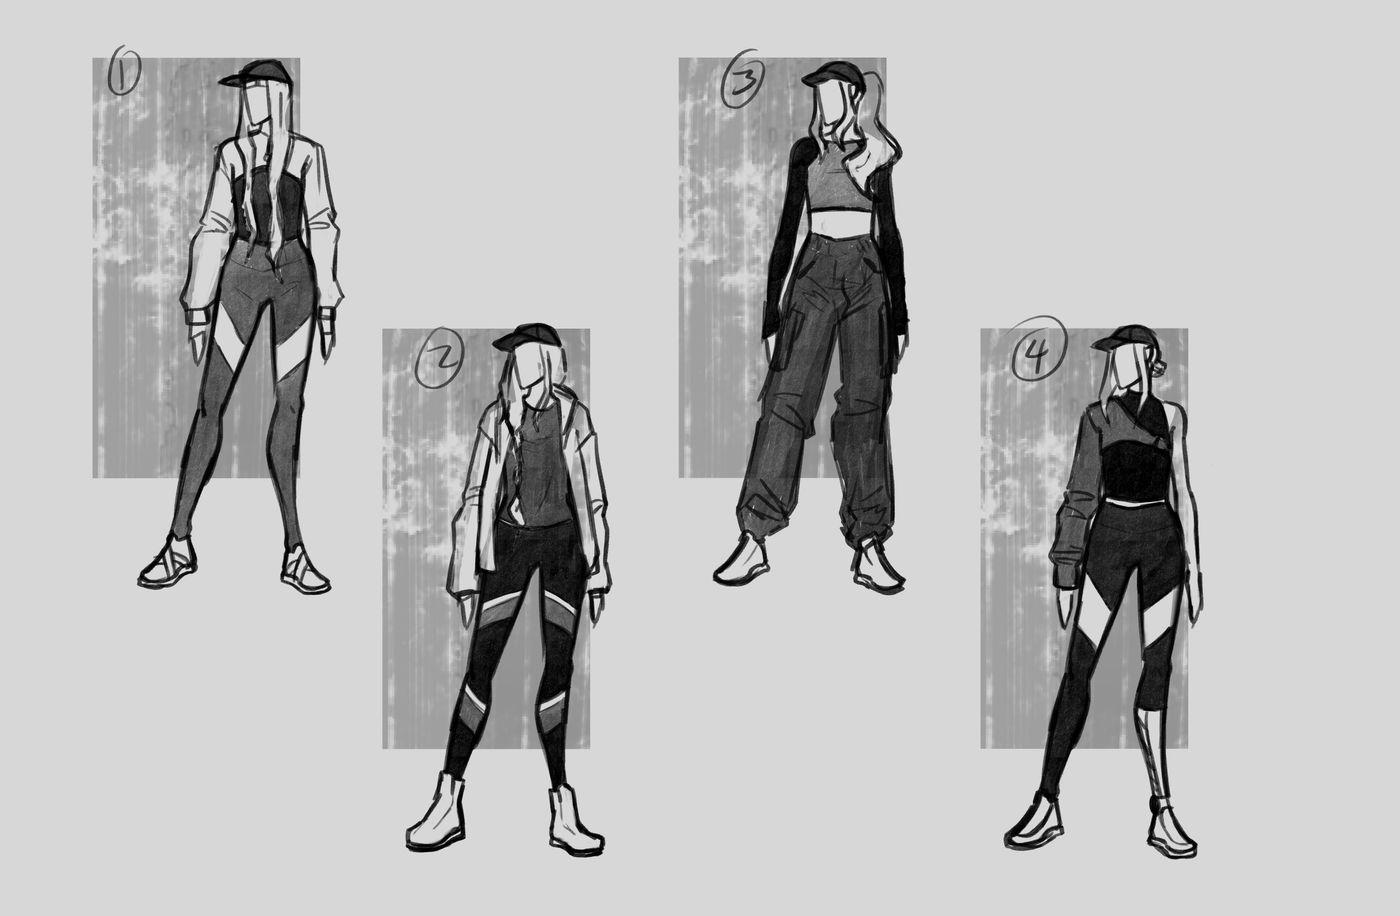 Steer Jasmine %20 Scme3420 Rookies %20 Character Design Thumbnails01 Jasminesteer